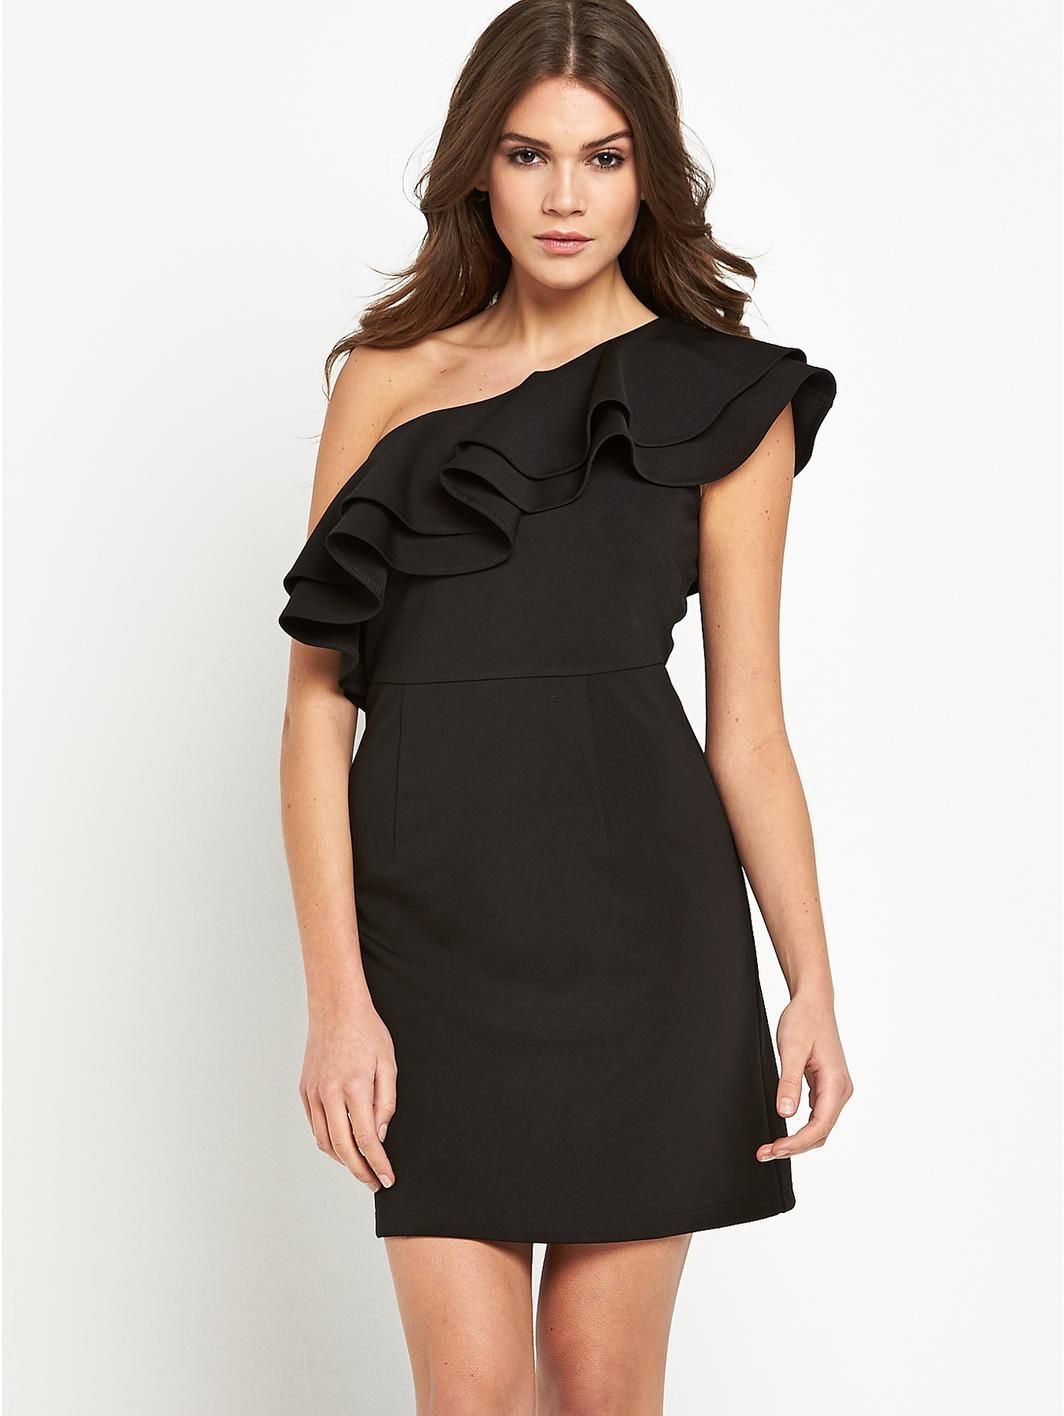 Ruffle shoulder mini dress httplittlewoodslavish ruffle shoulder mini dress httplittlewoodslavish ombrellifo Image collections